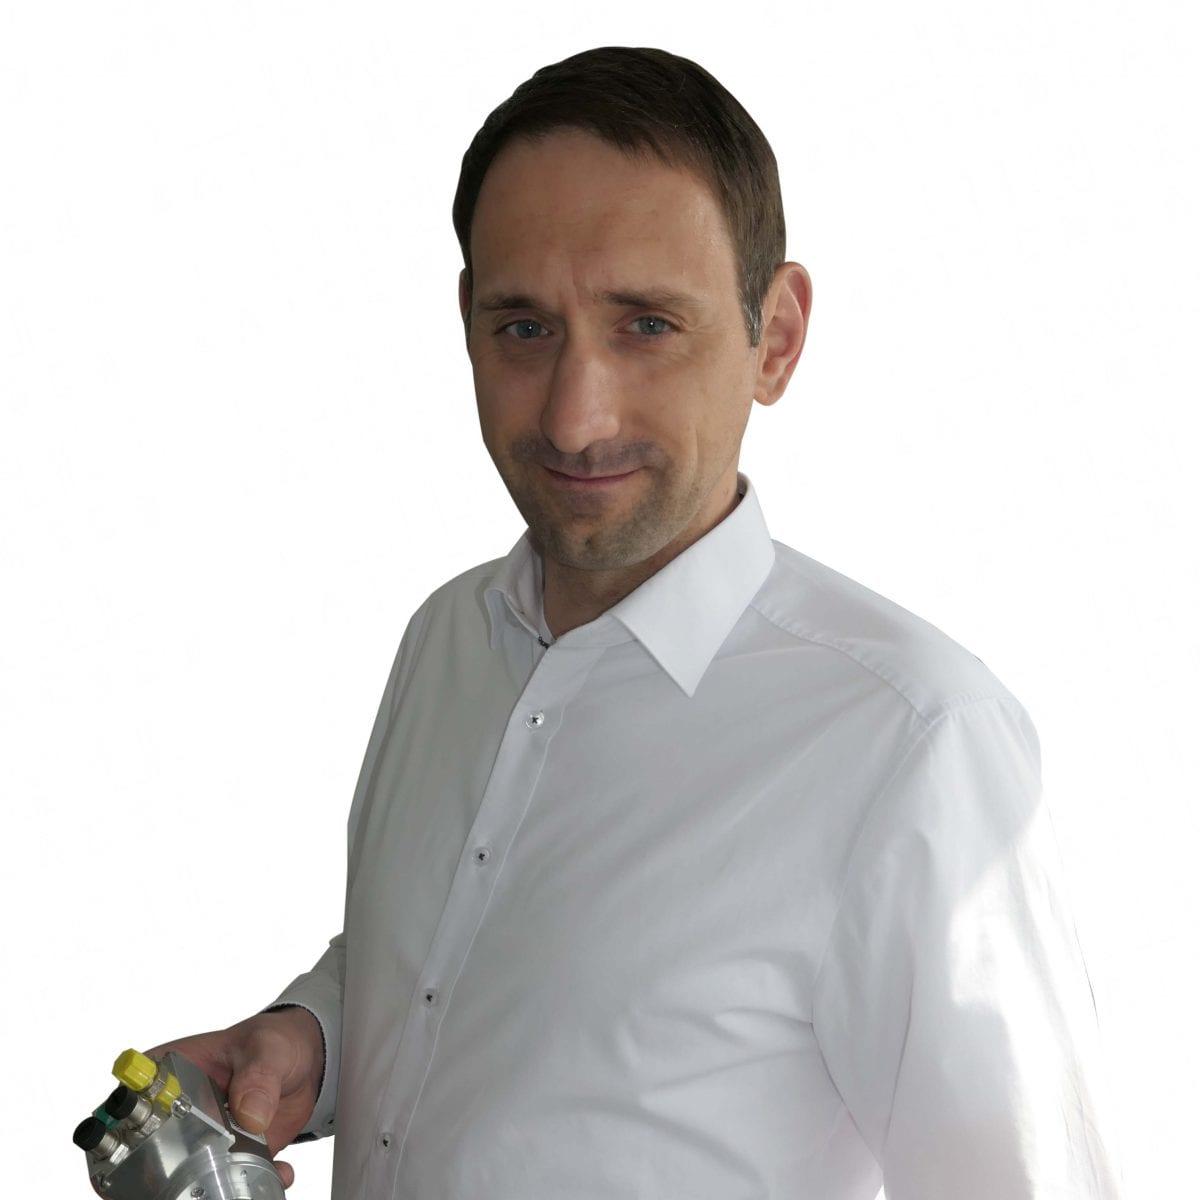 Werner Martus